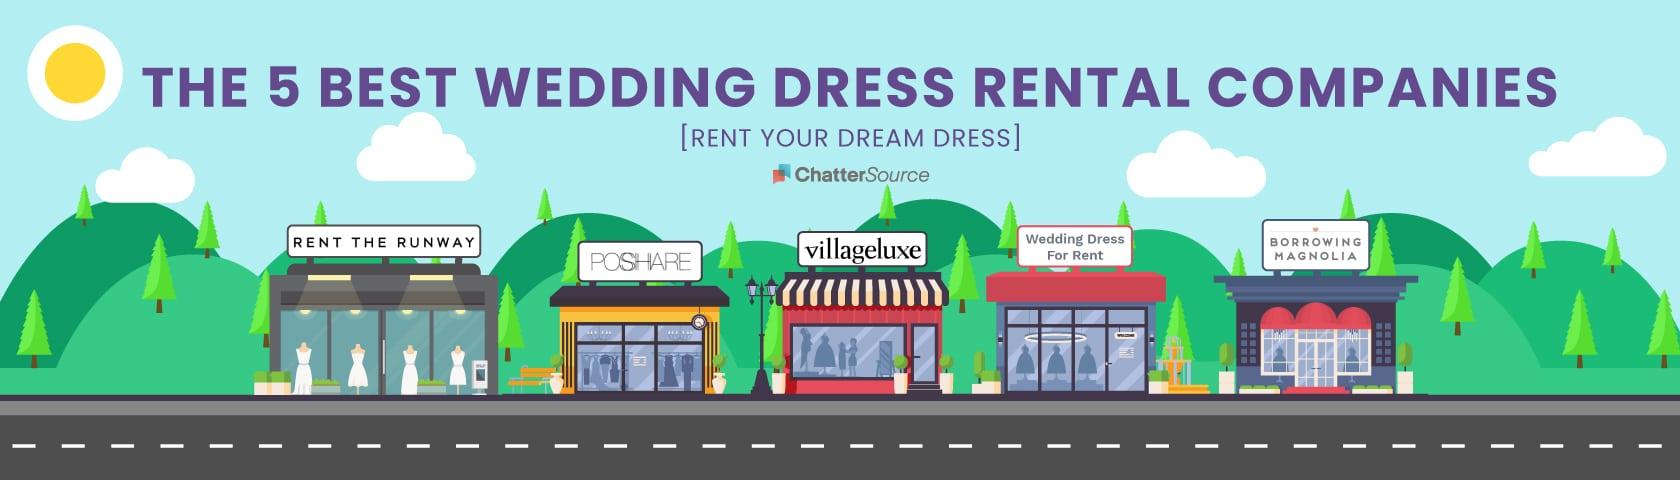 wedding dress rental companies infographic